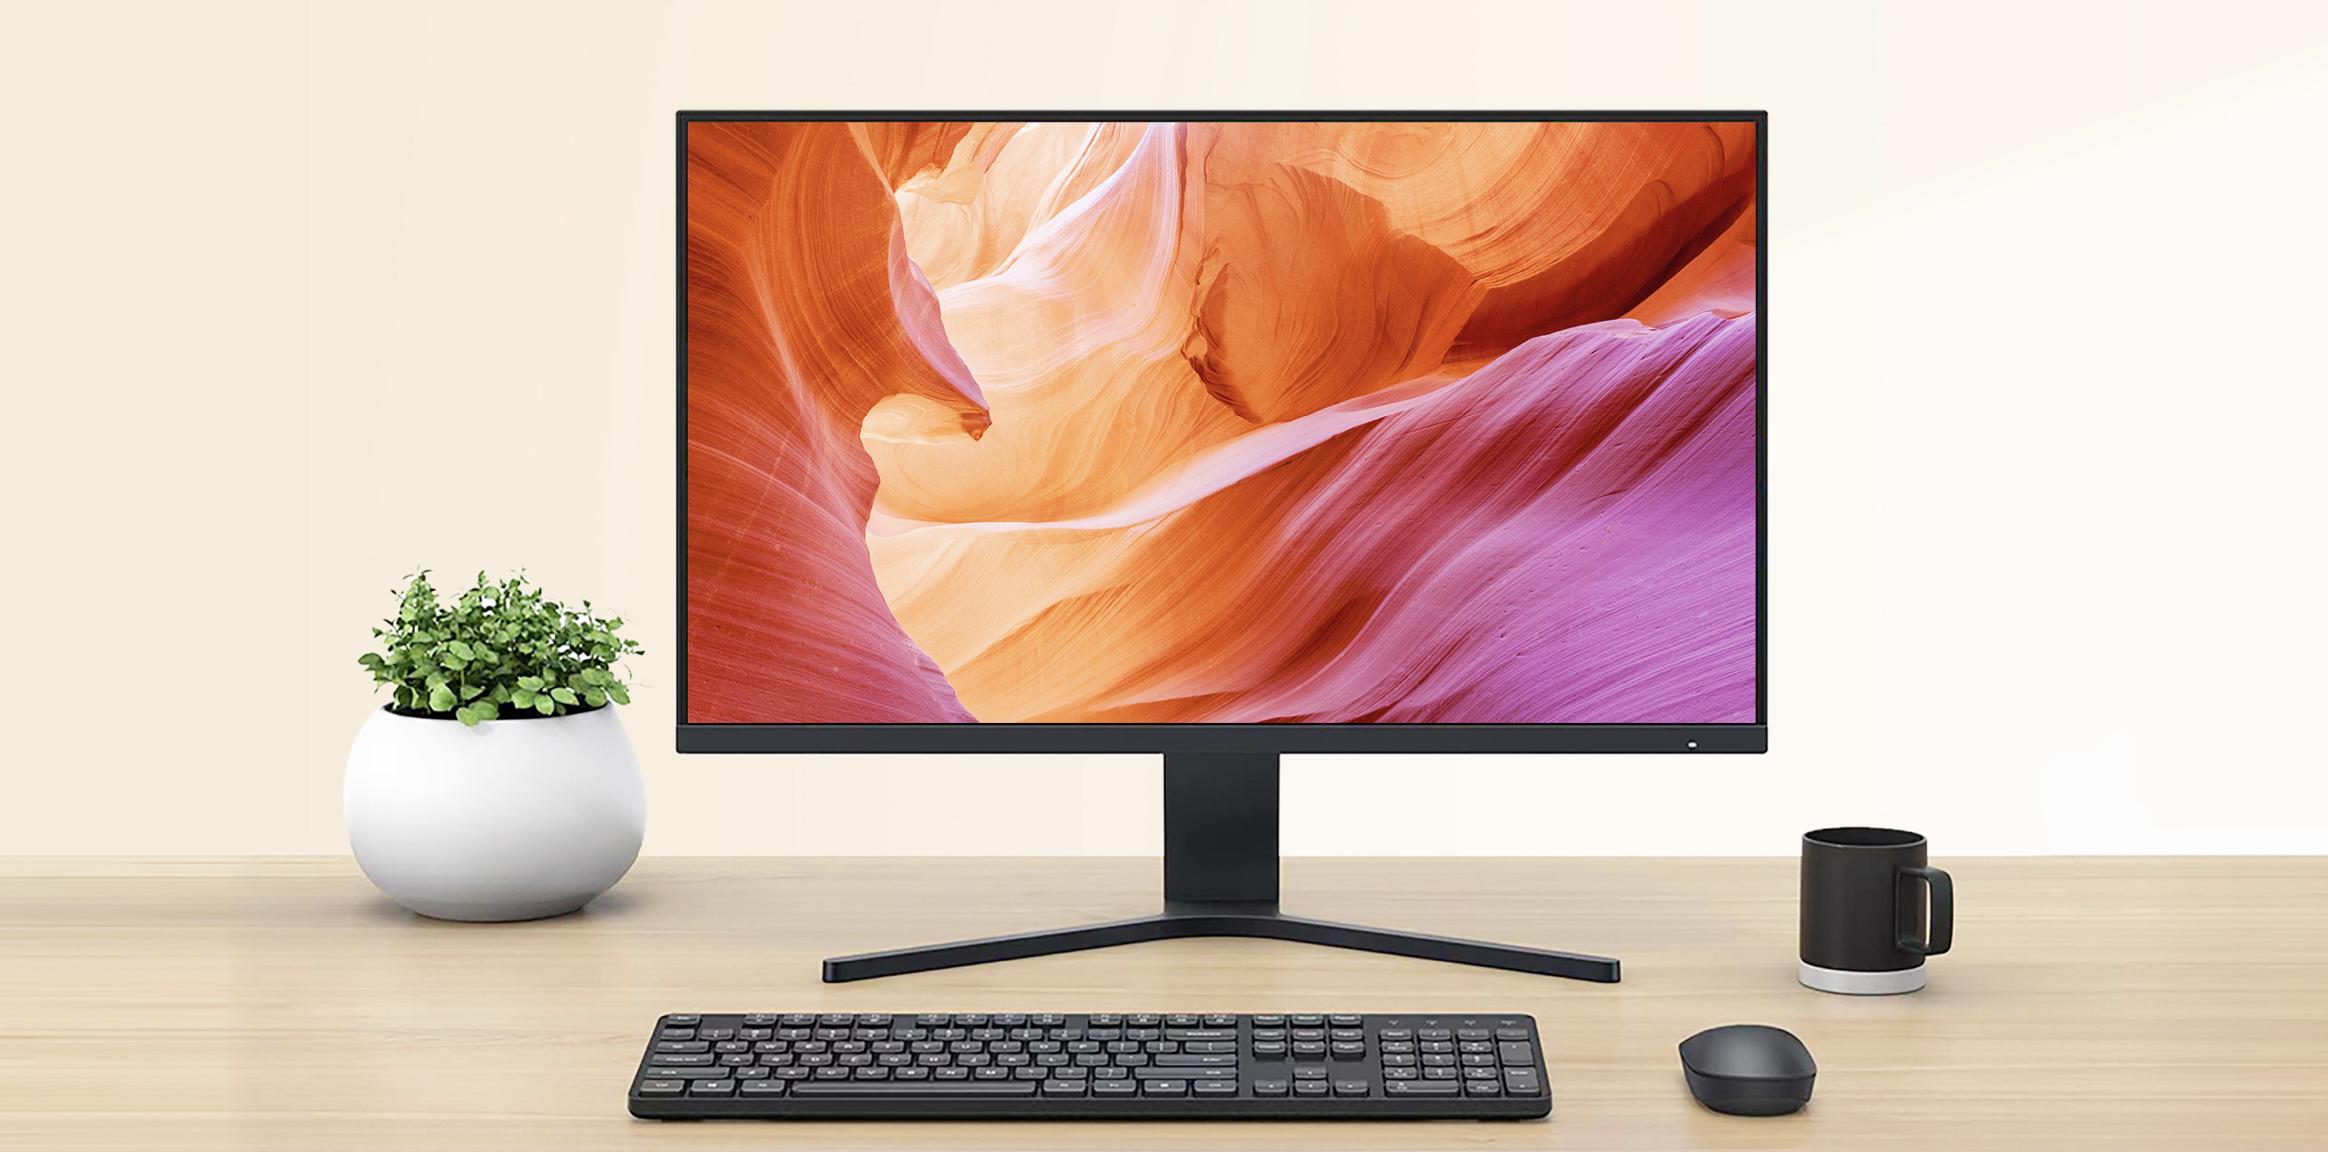 Xiaomi Mi Desktop Monitor 27-inch Priced in the Philippines